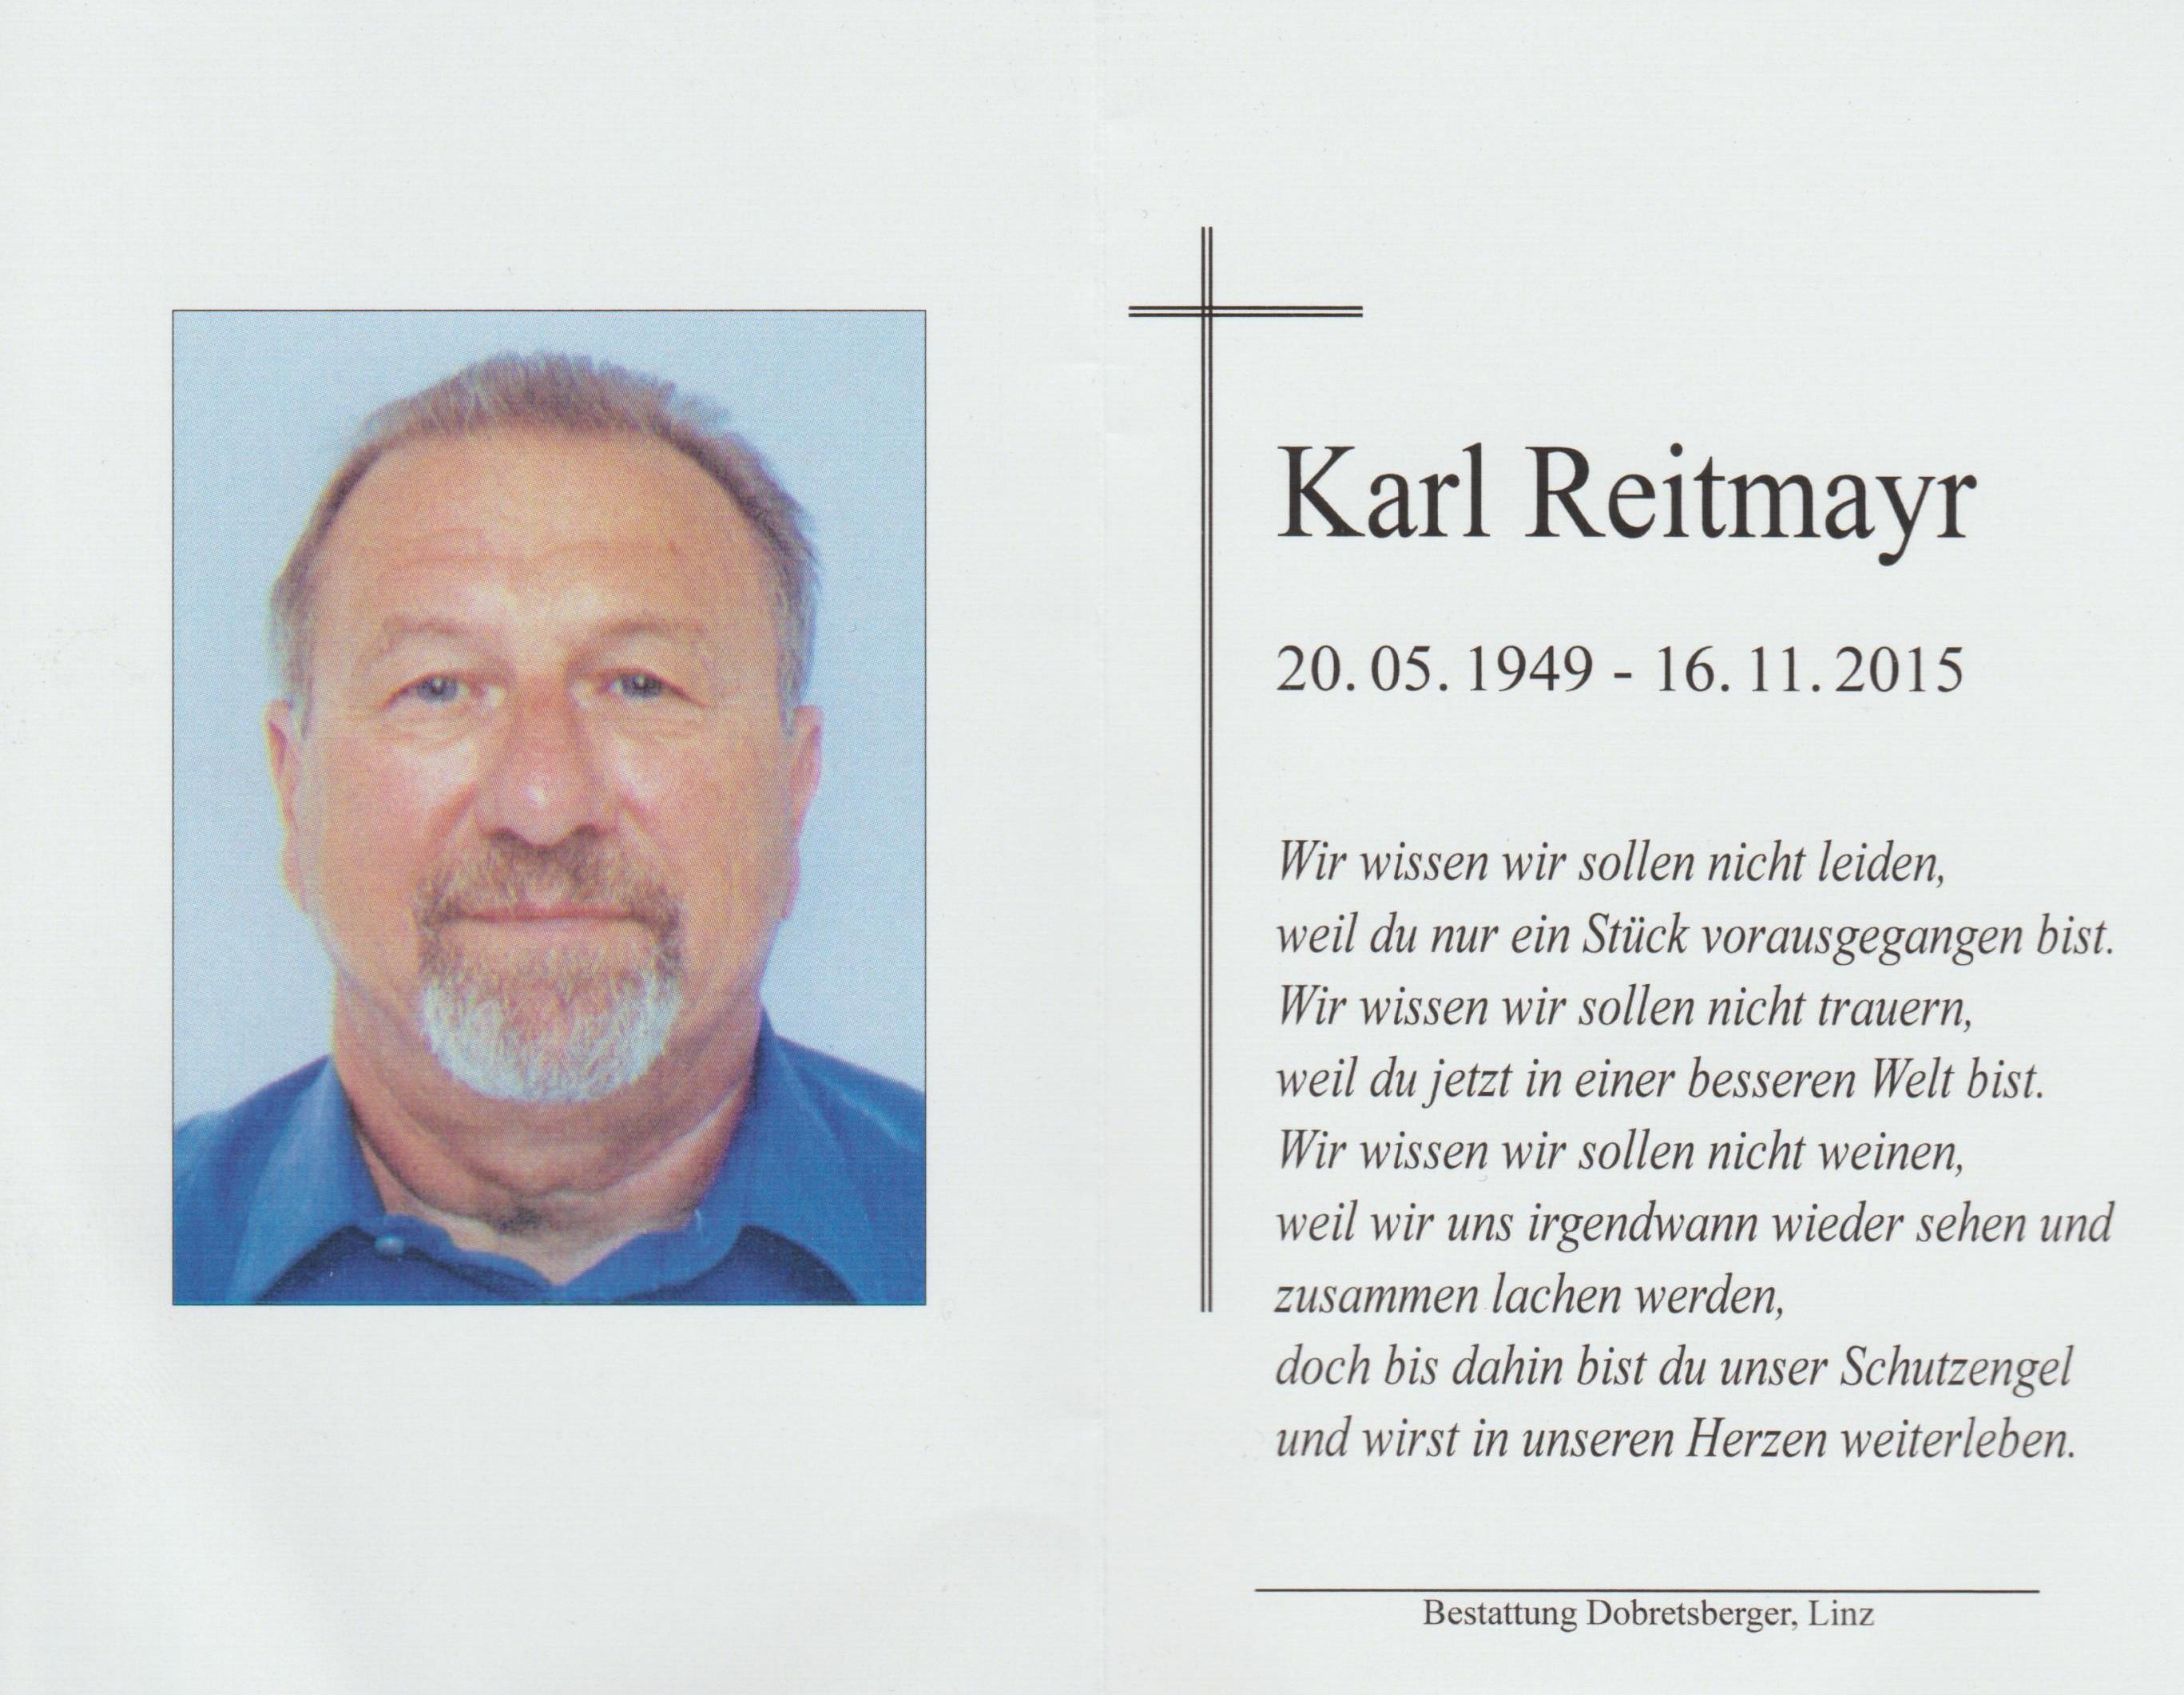 Reitmayr Karl Totenbild